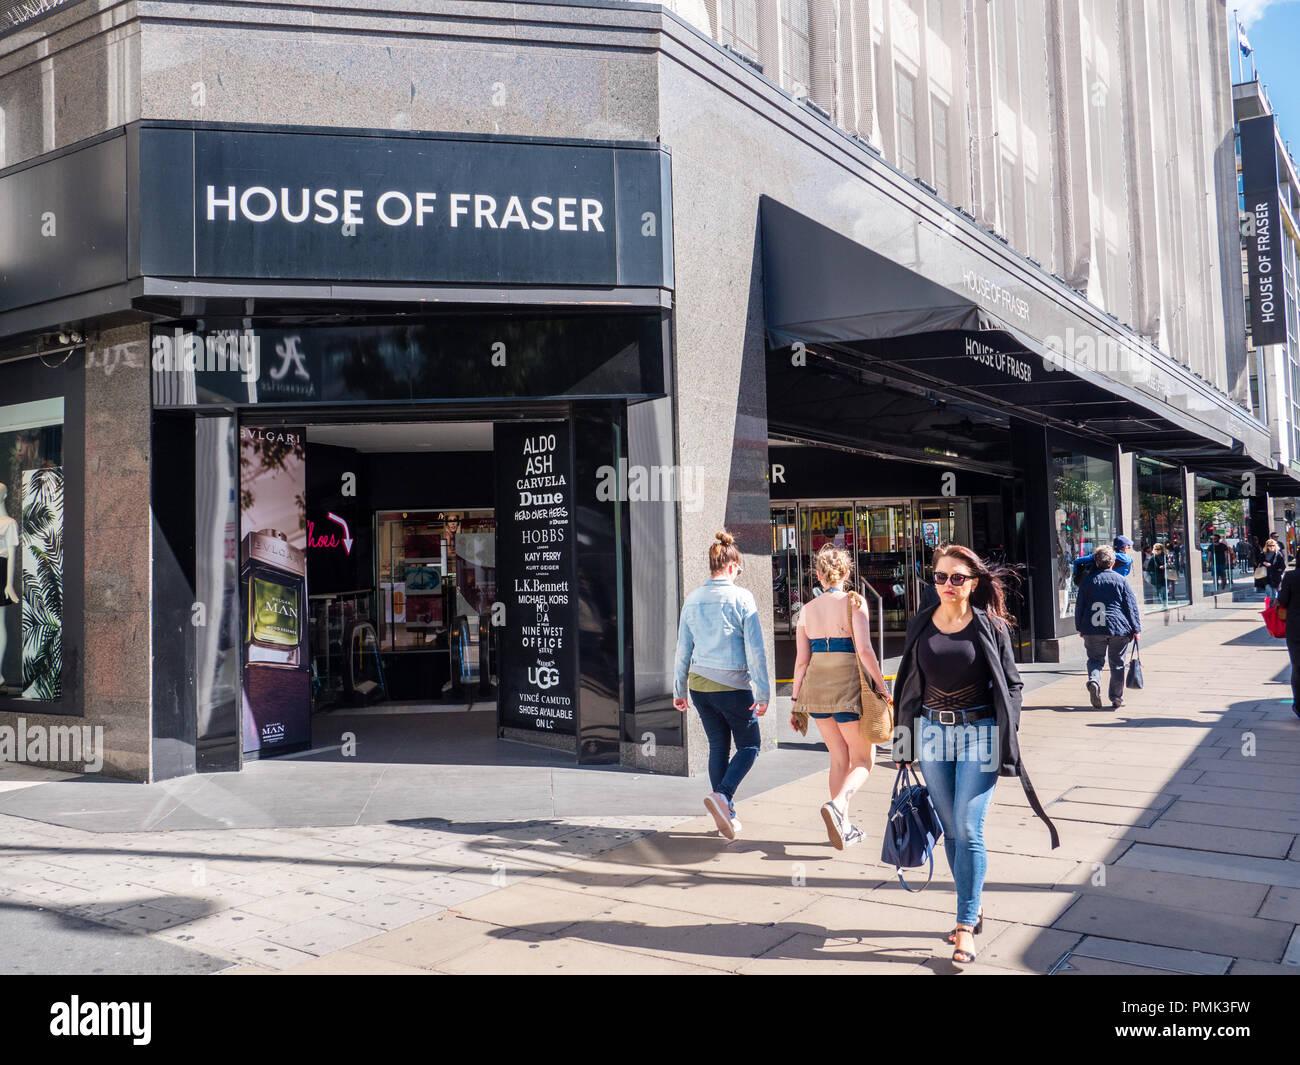 b6bd81ec6e3 House Of Fraser Department Store Stock Photos   House Of Fraser ...